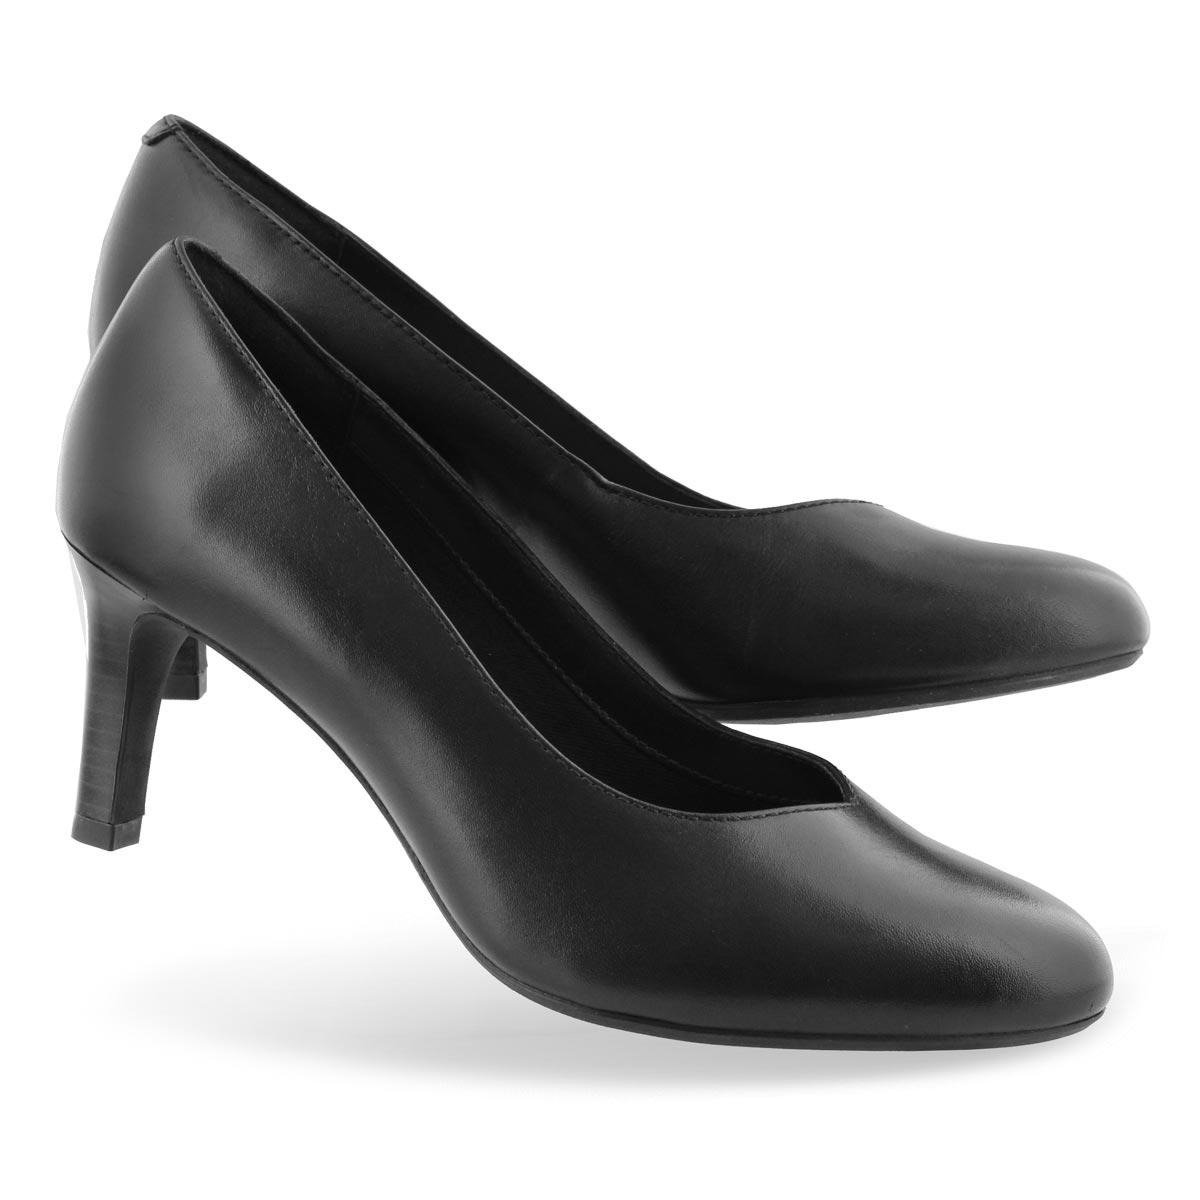 Escarpin DANCER NOLIN,habillé,noir,femme